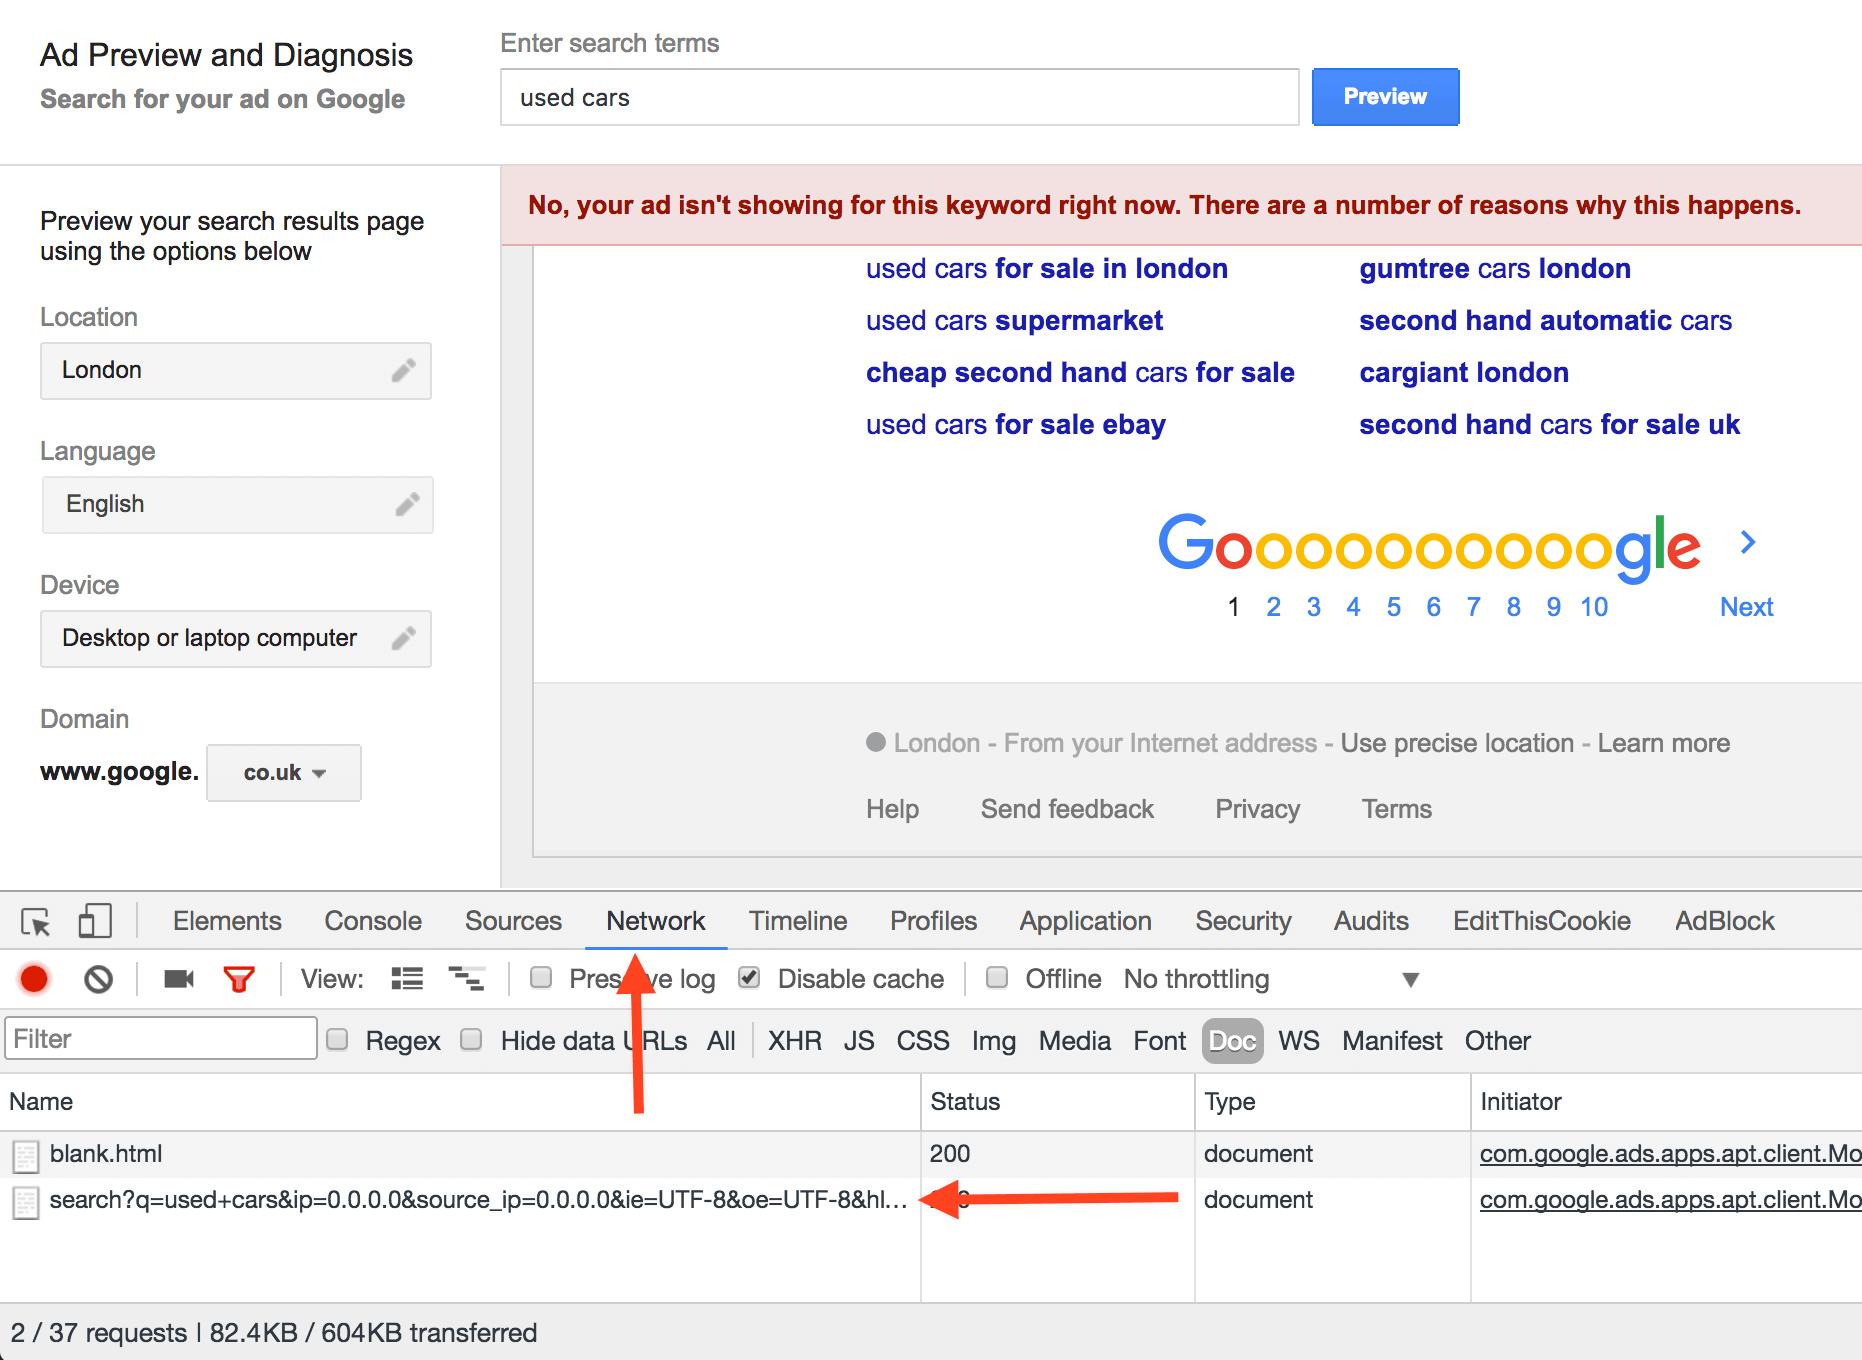 Keywords in Ads